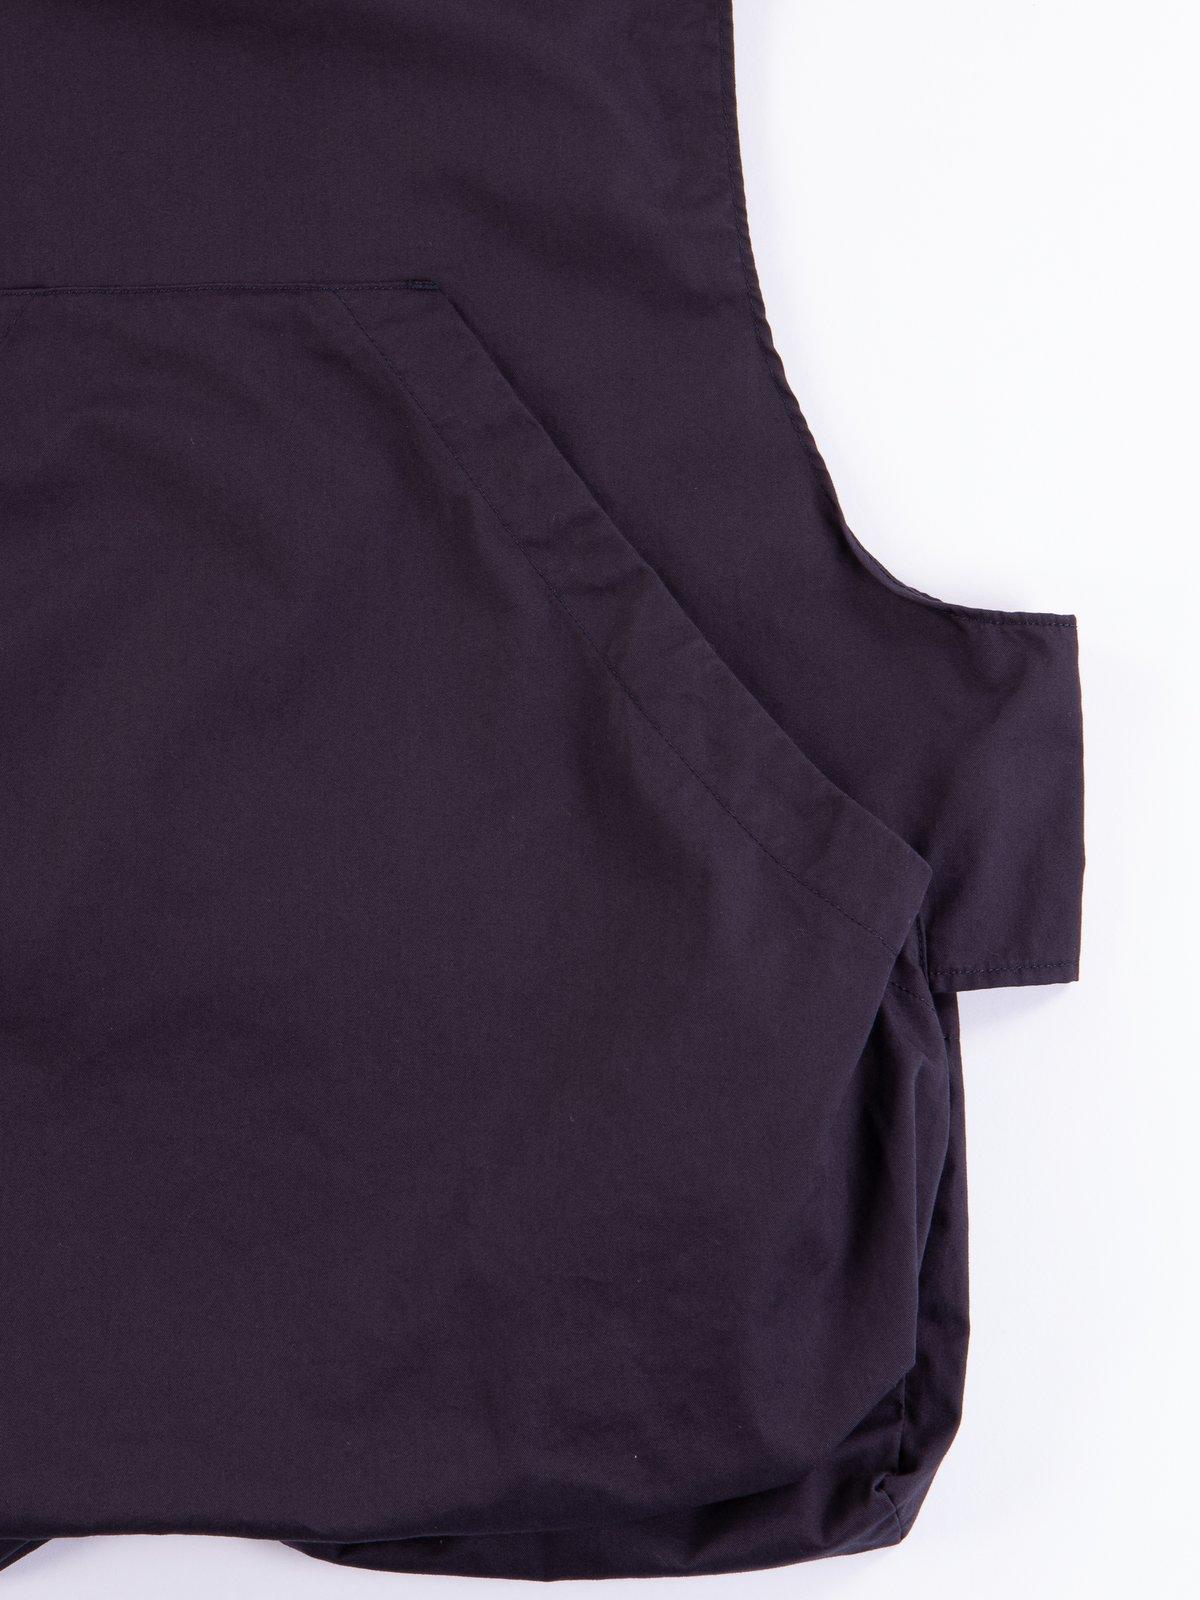 Dark Navy High Count Twill Fowl Vest - Image 5